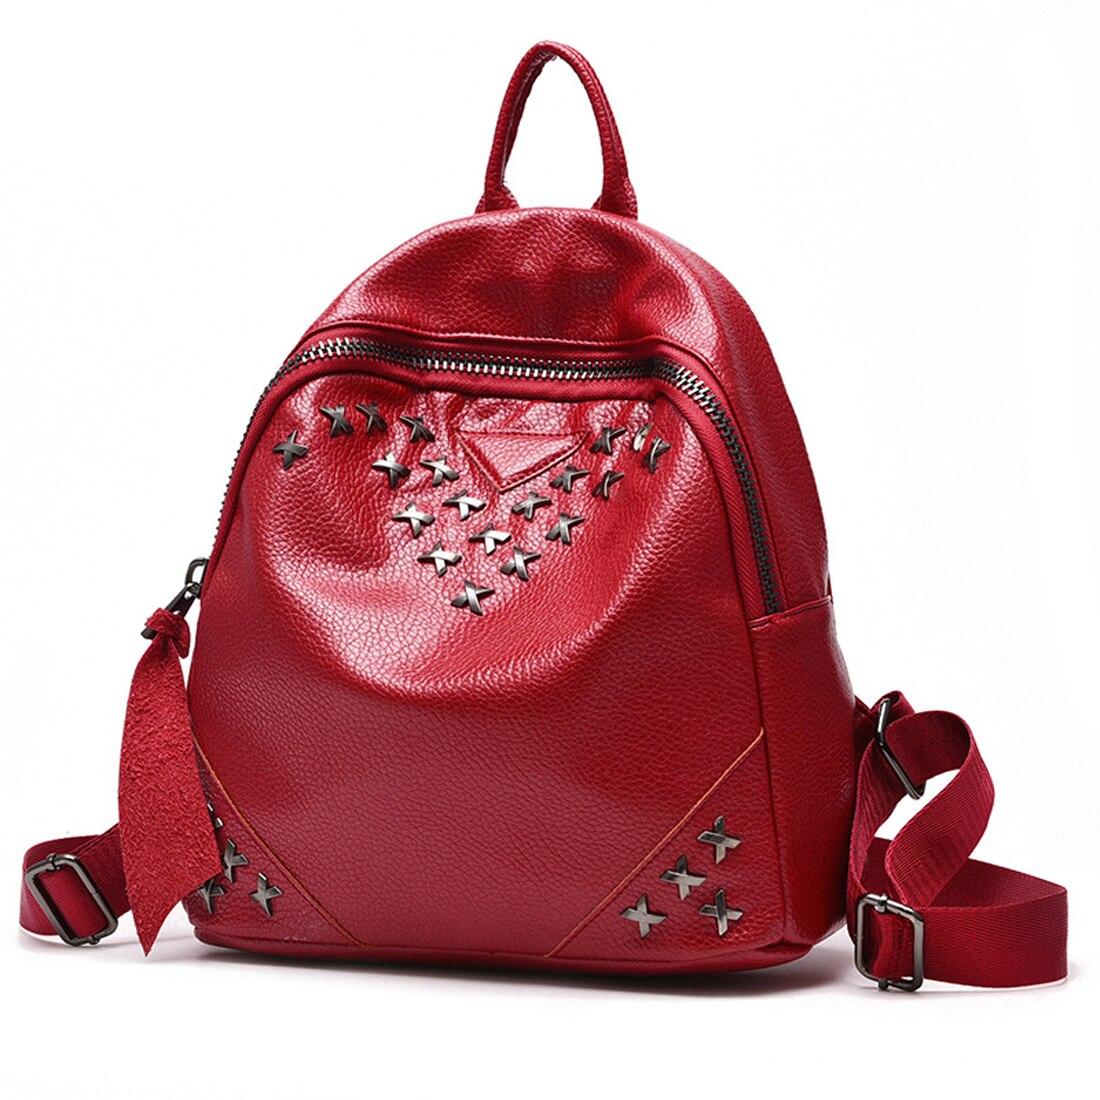 Women Backpacks Rivet Black High Quality Black red Leather Bags Shoulder Schoolbags For Girls Female Backpacks